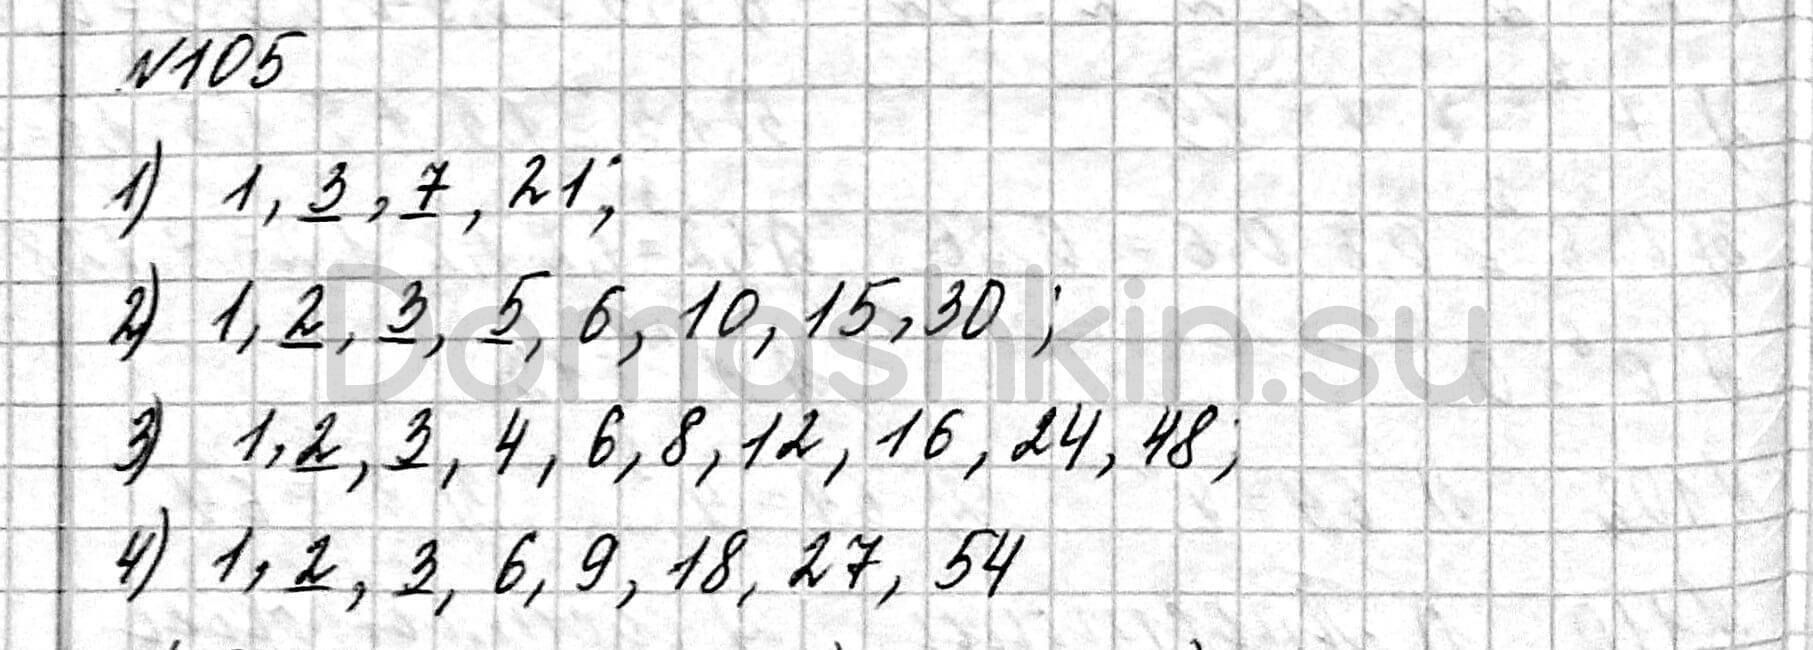 Математика 6 класс учебник Мерзляк номер 105 решение